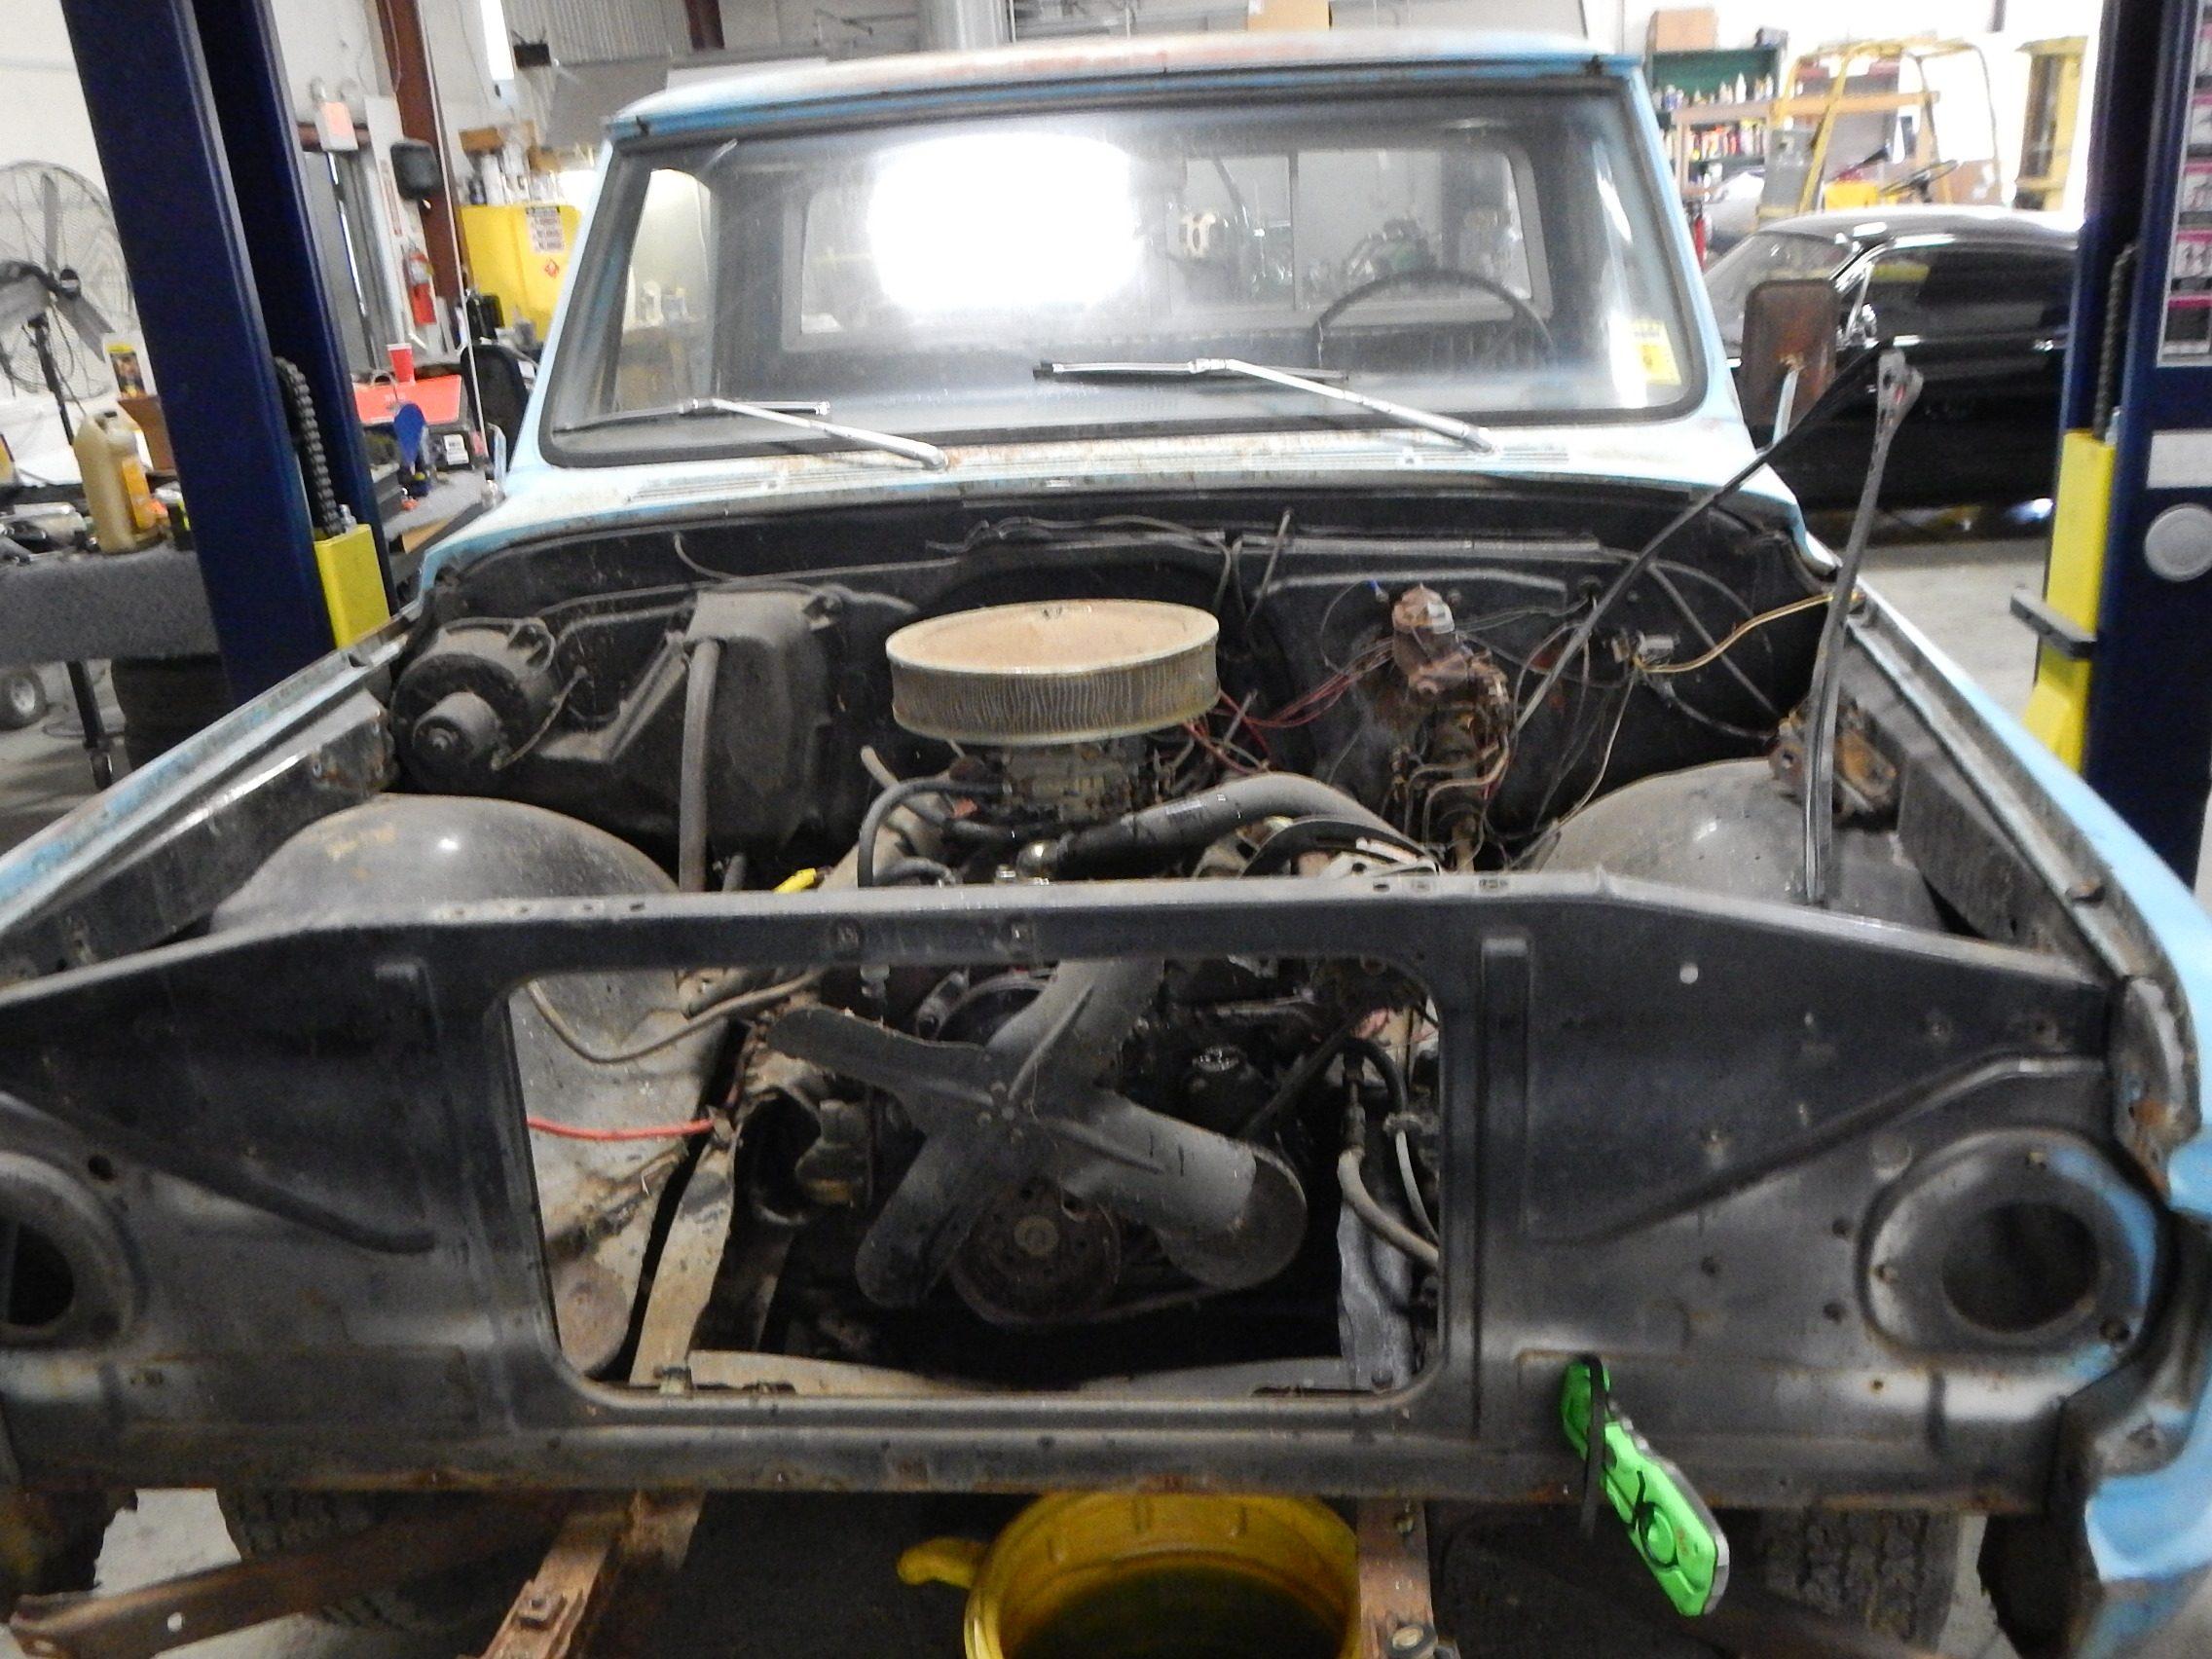 1967 Chevy C-10 restoration 11.jpg